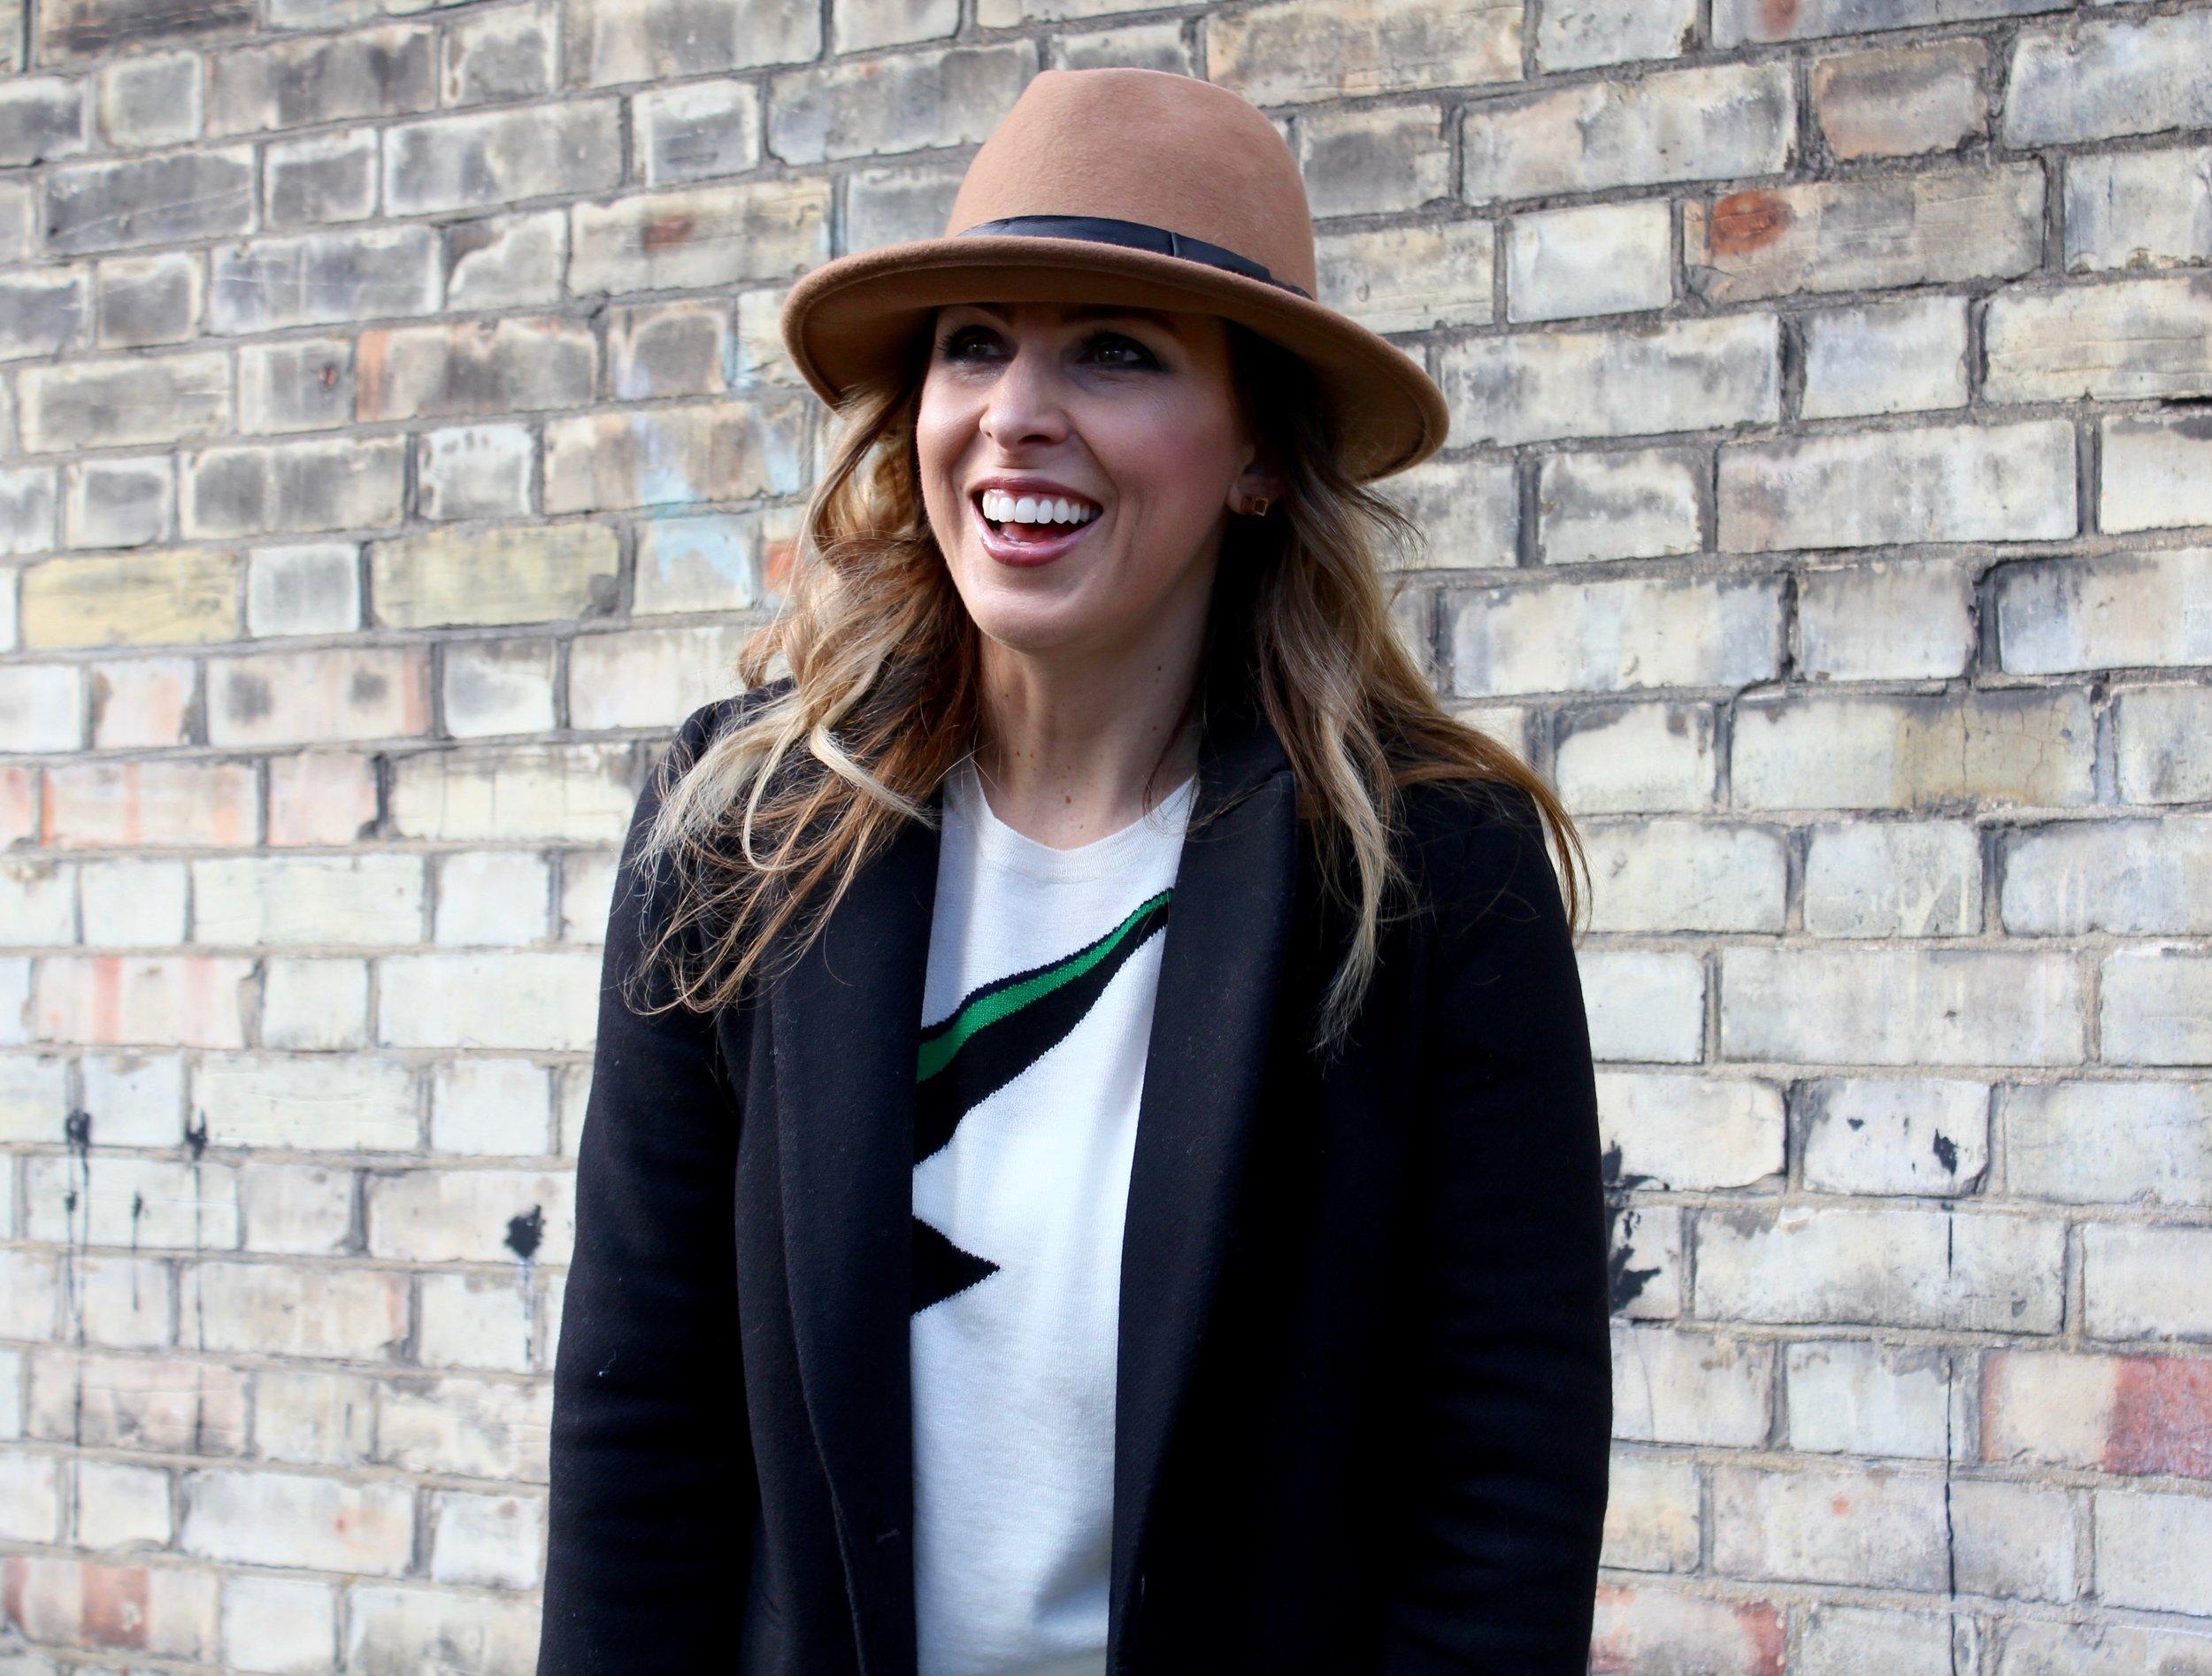 Carly Madhvani NW3 Interiors Hampstead Mums Interview